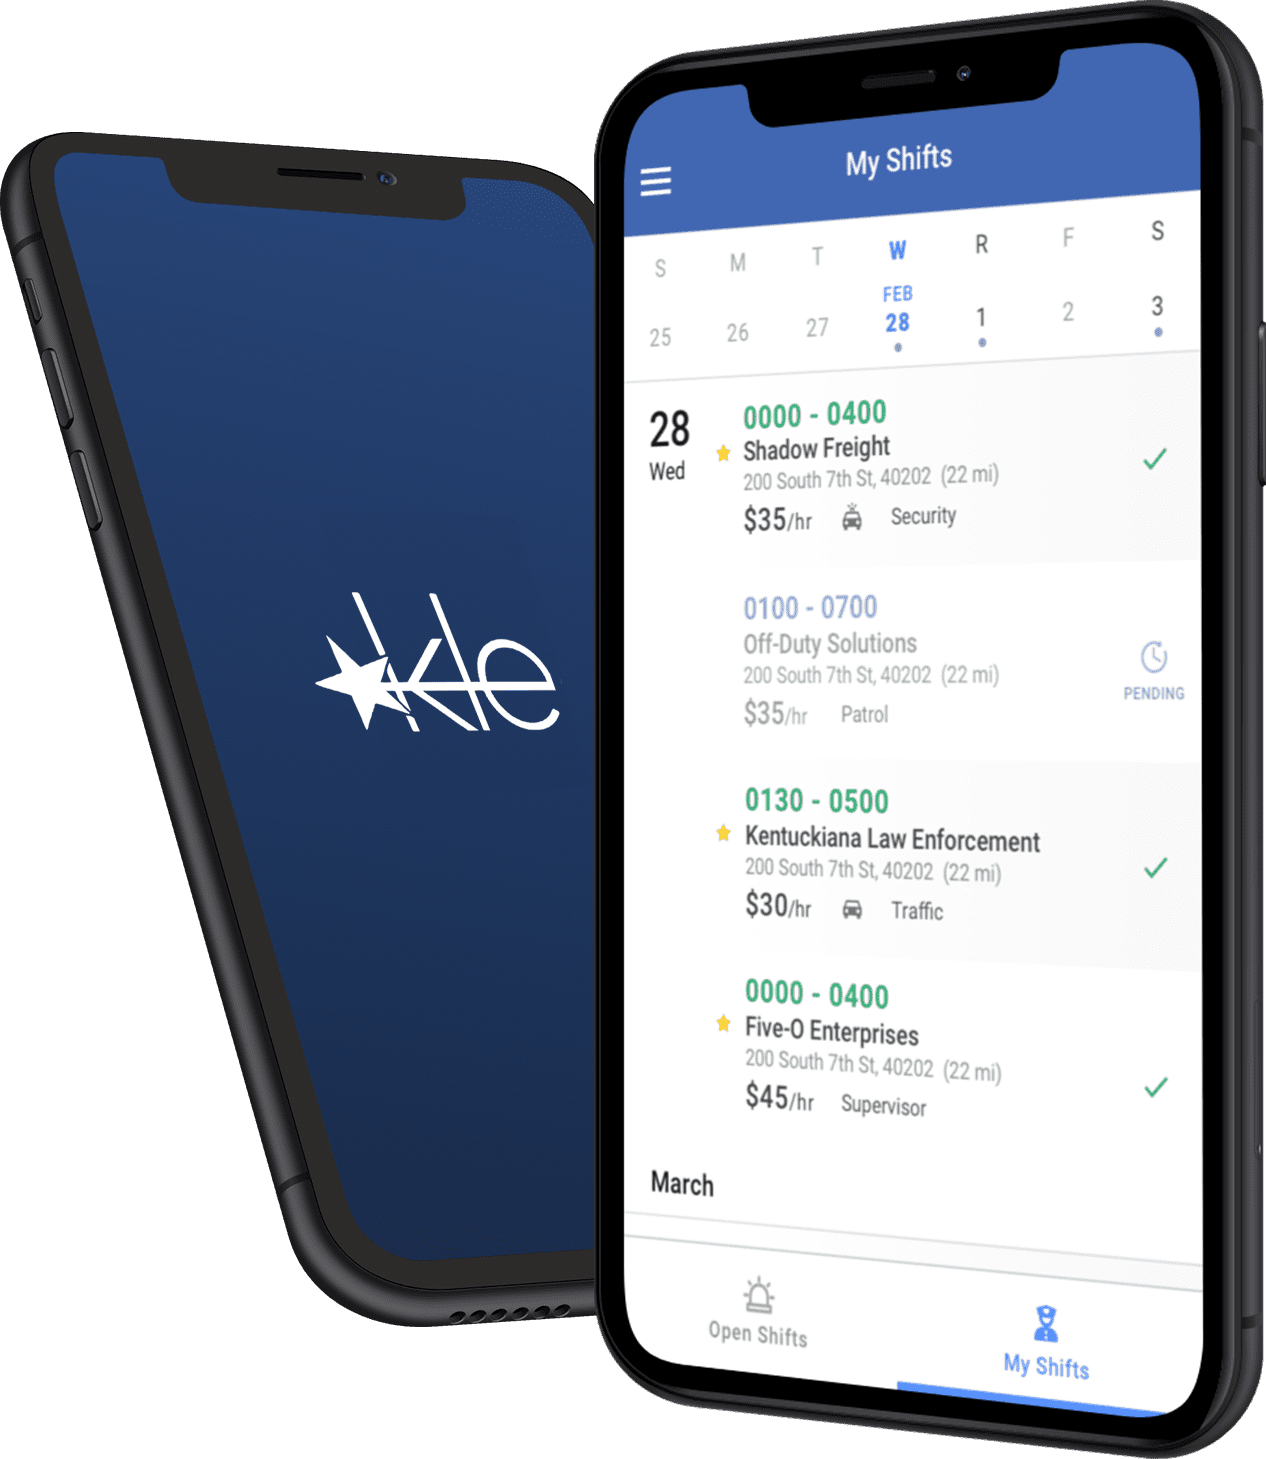 KLE Mobile App